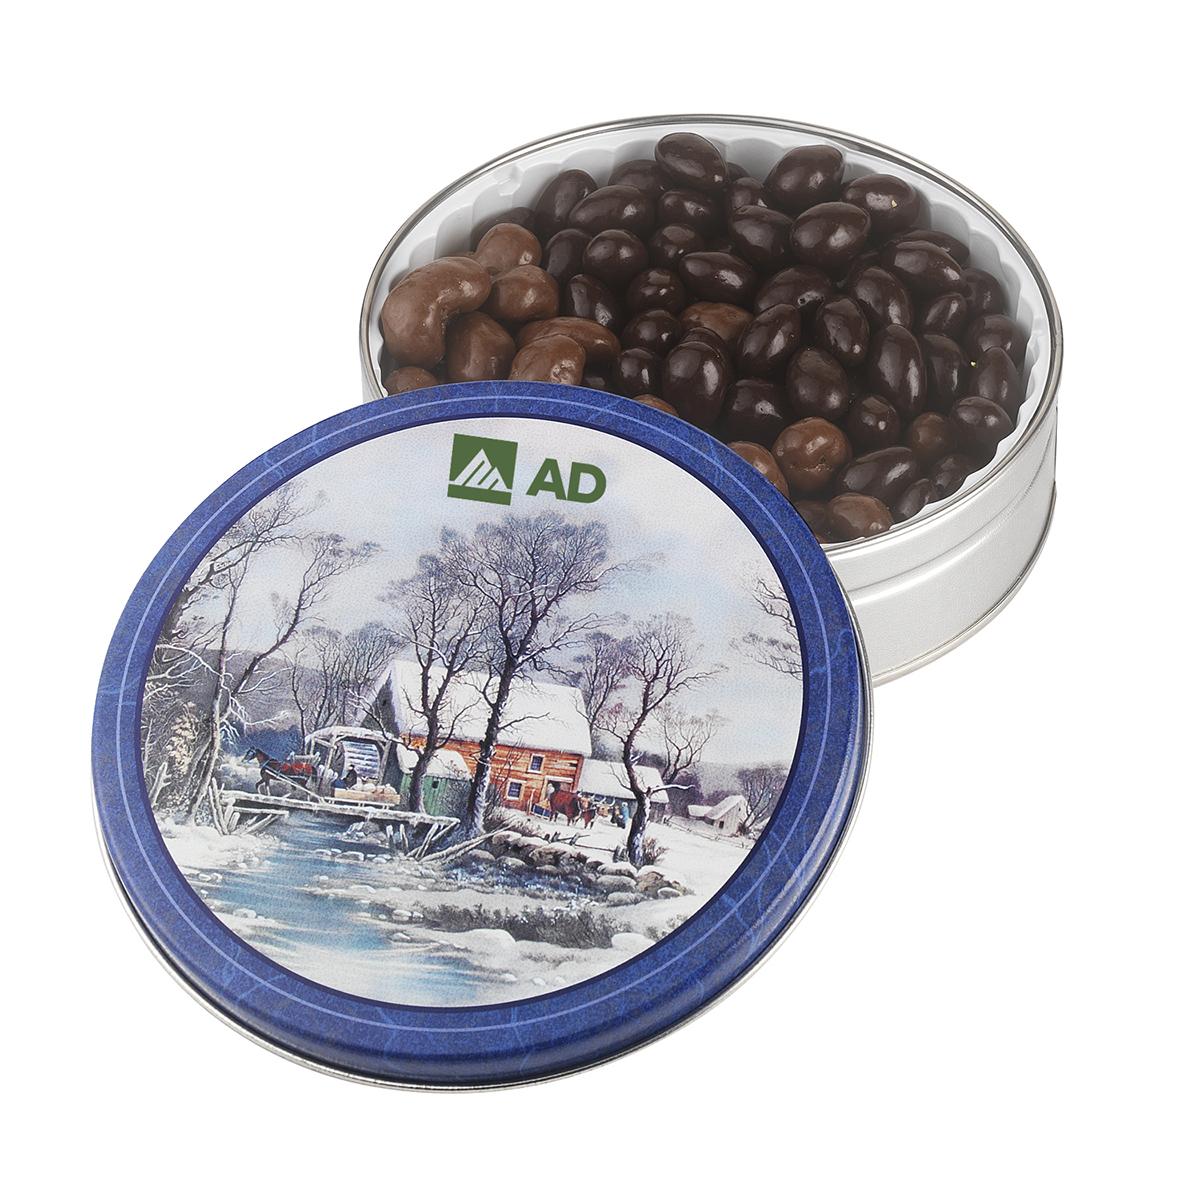 Glad Tidings Tin w/ Dark Choc Almonds & Milk Choc Cashews, 600-DCAM, Full Colour Imprint